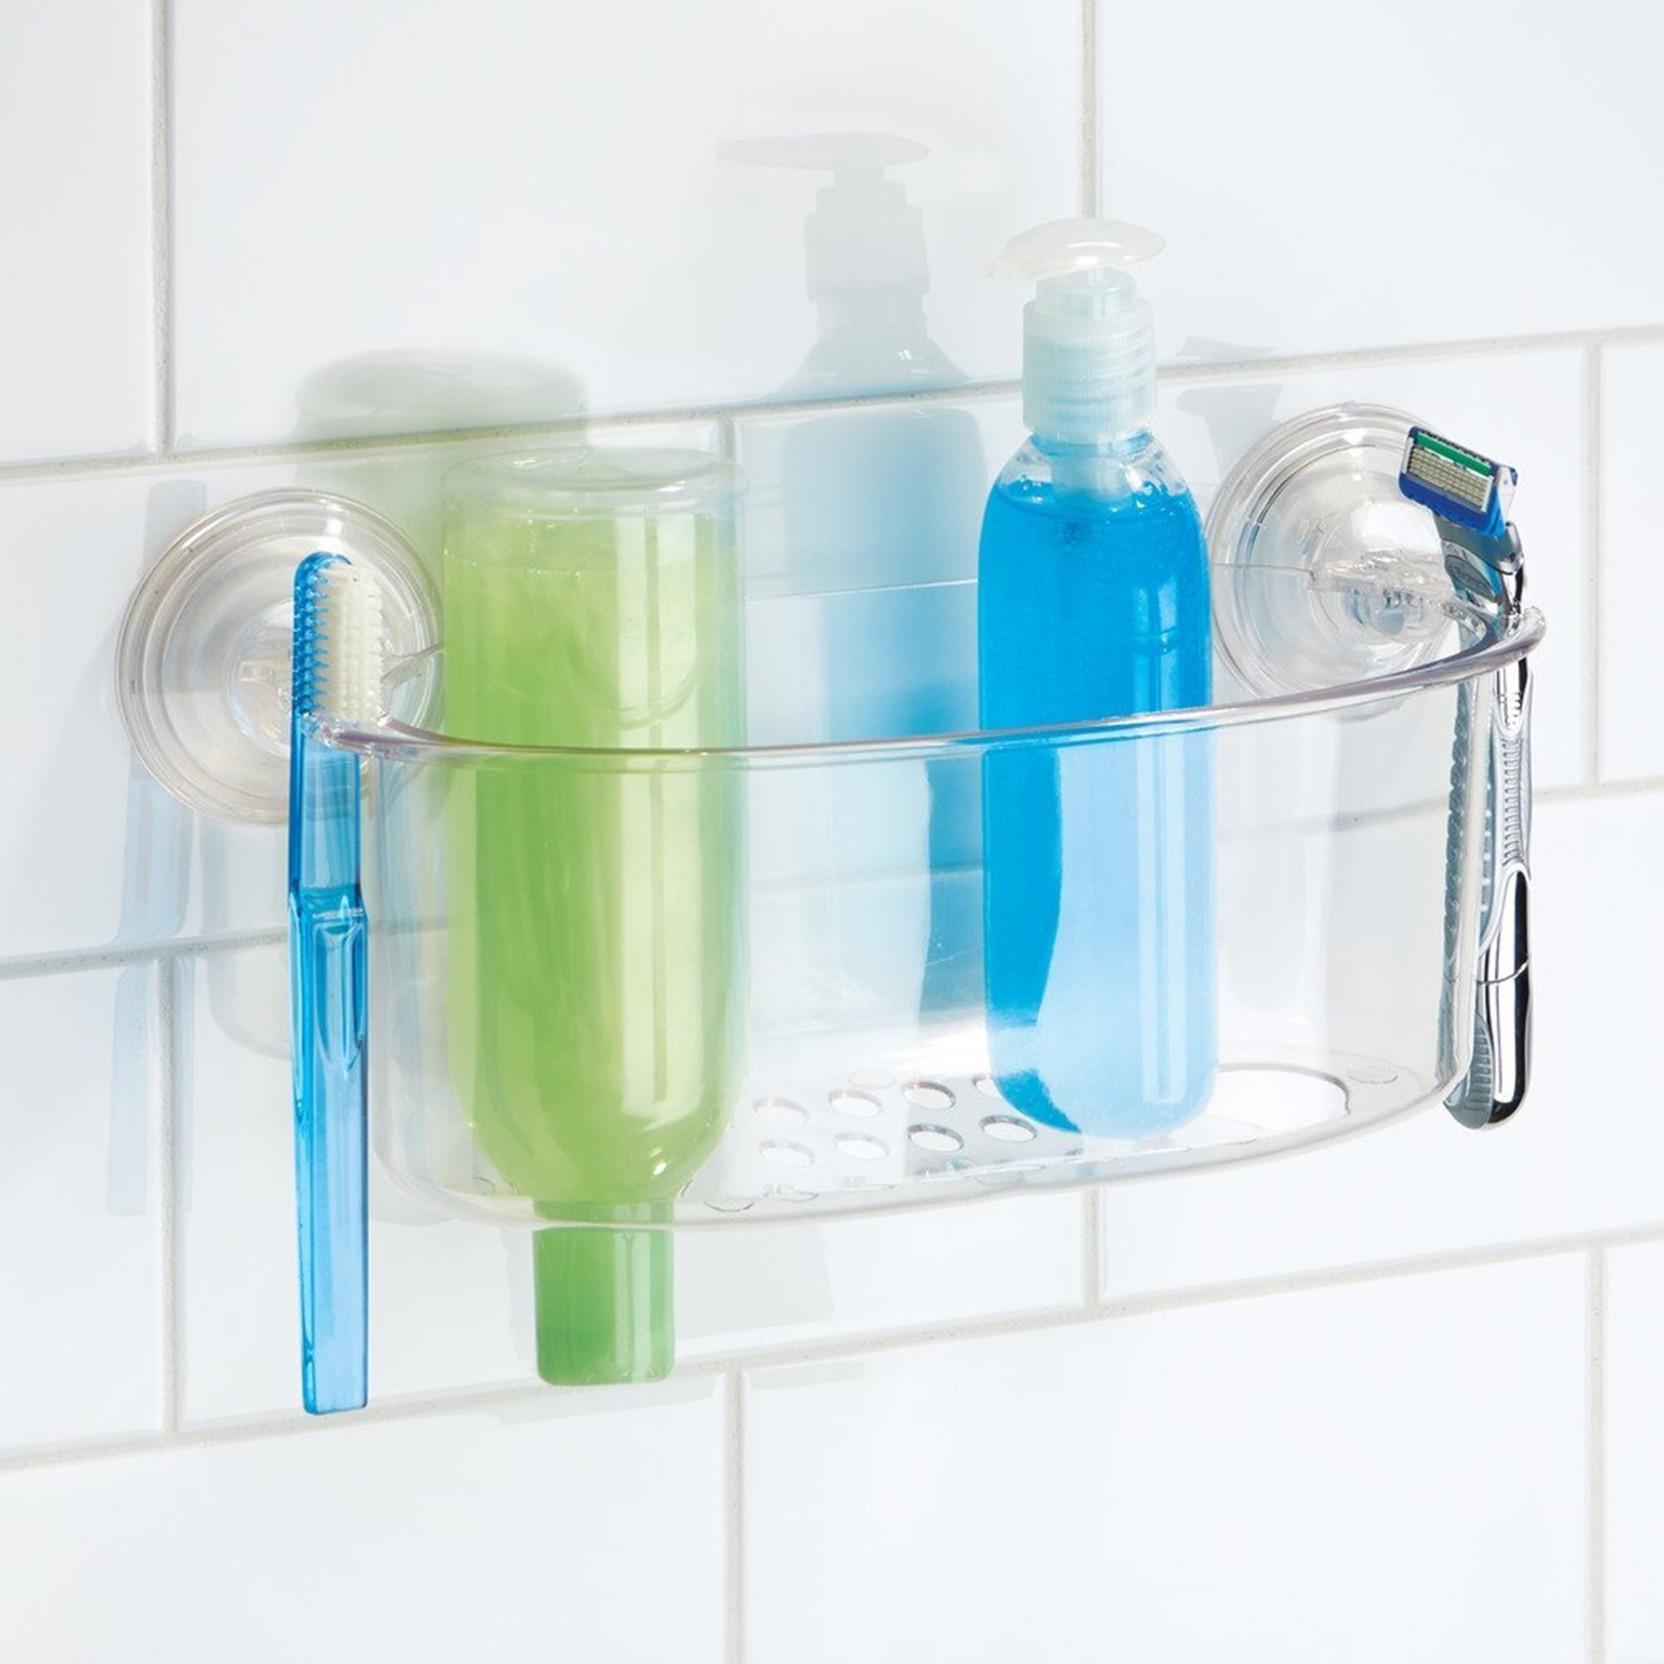 Interdesign Power Lock Suction Bathroom Shower Caddy Basket Large ...